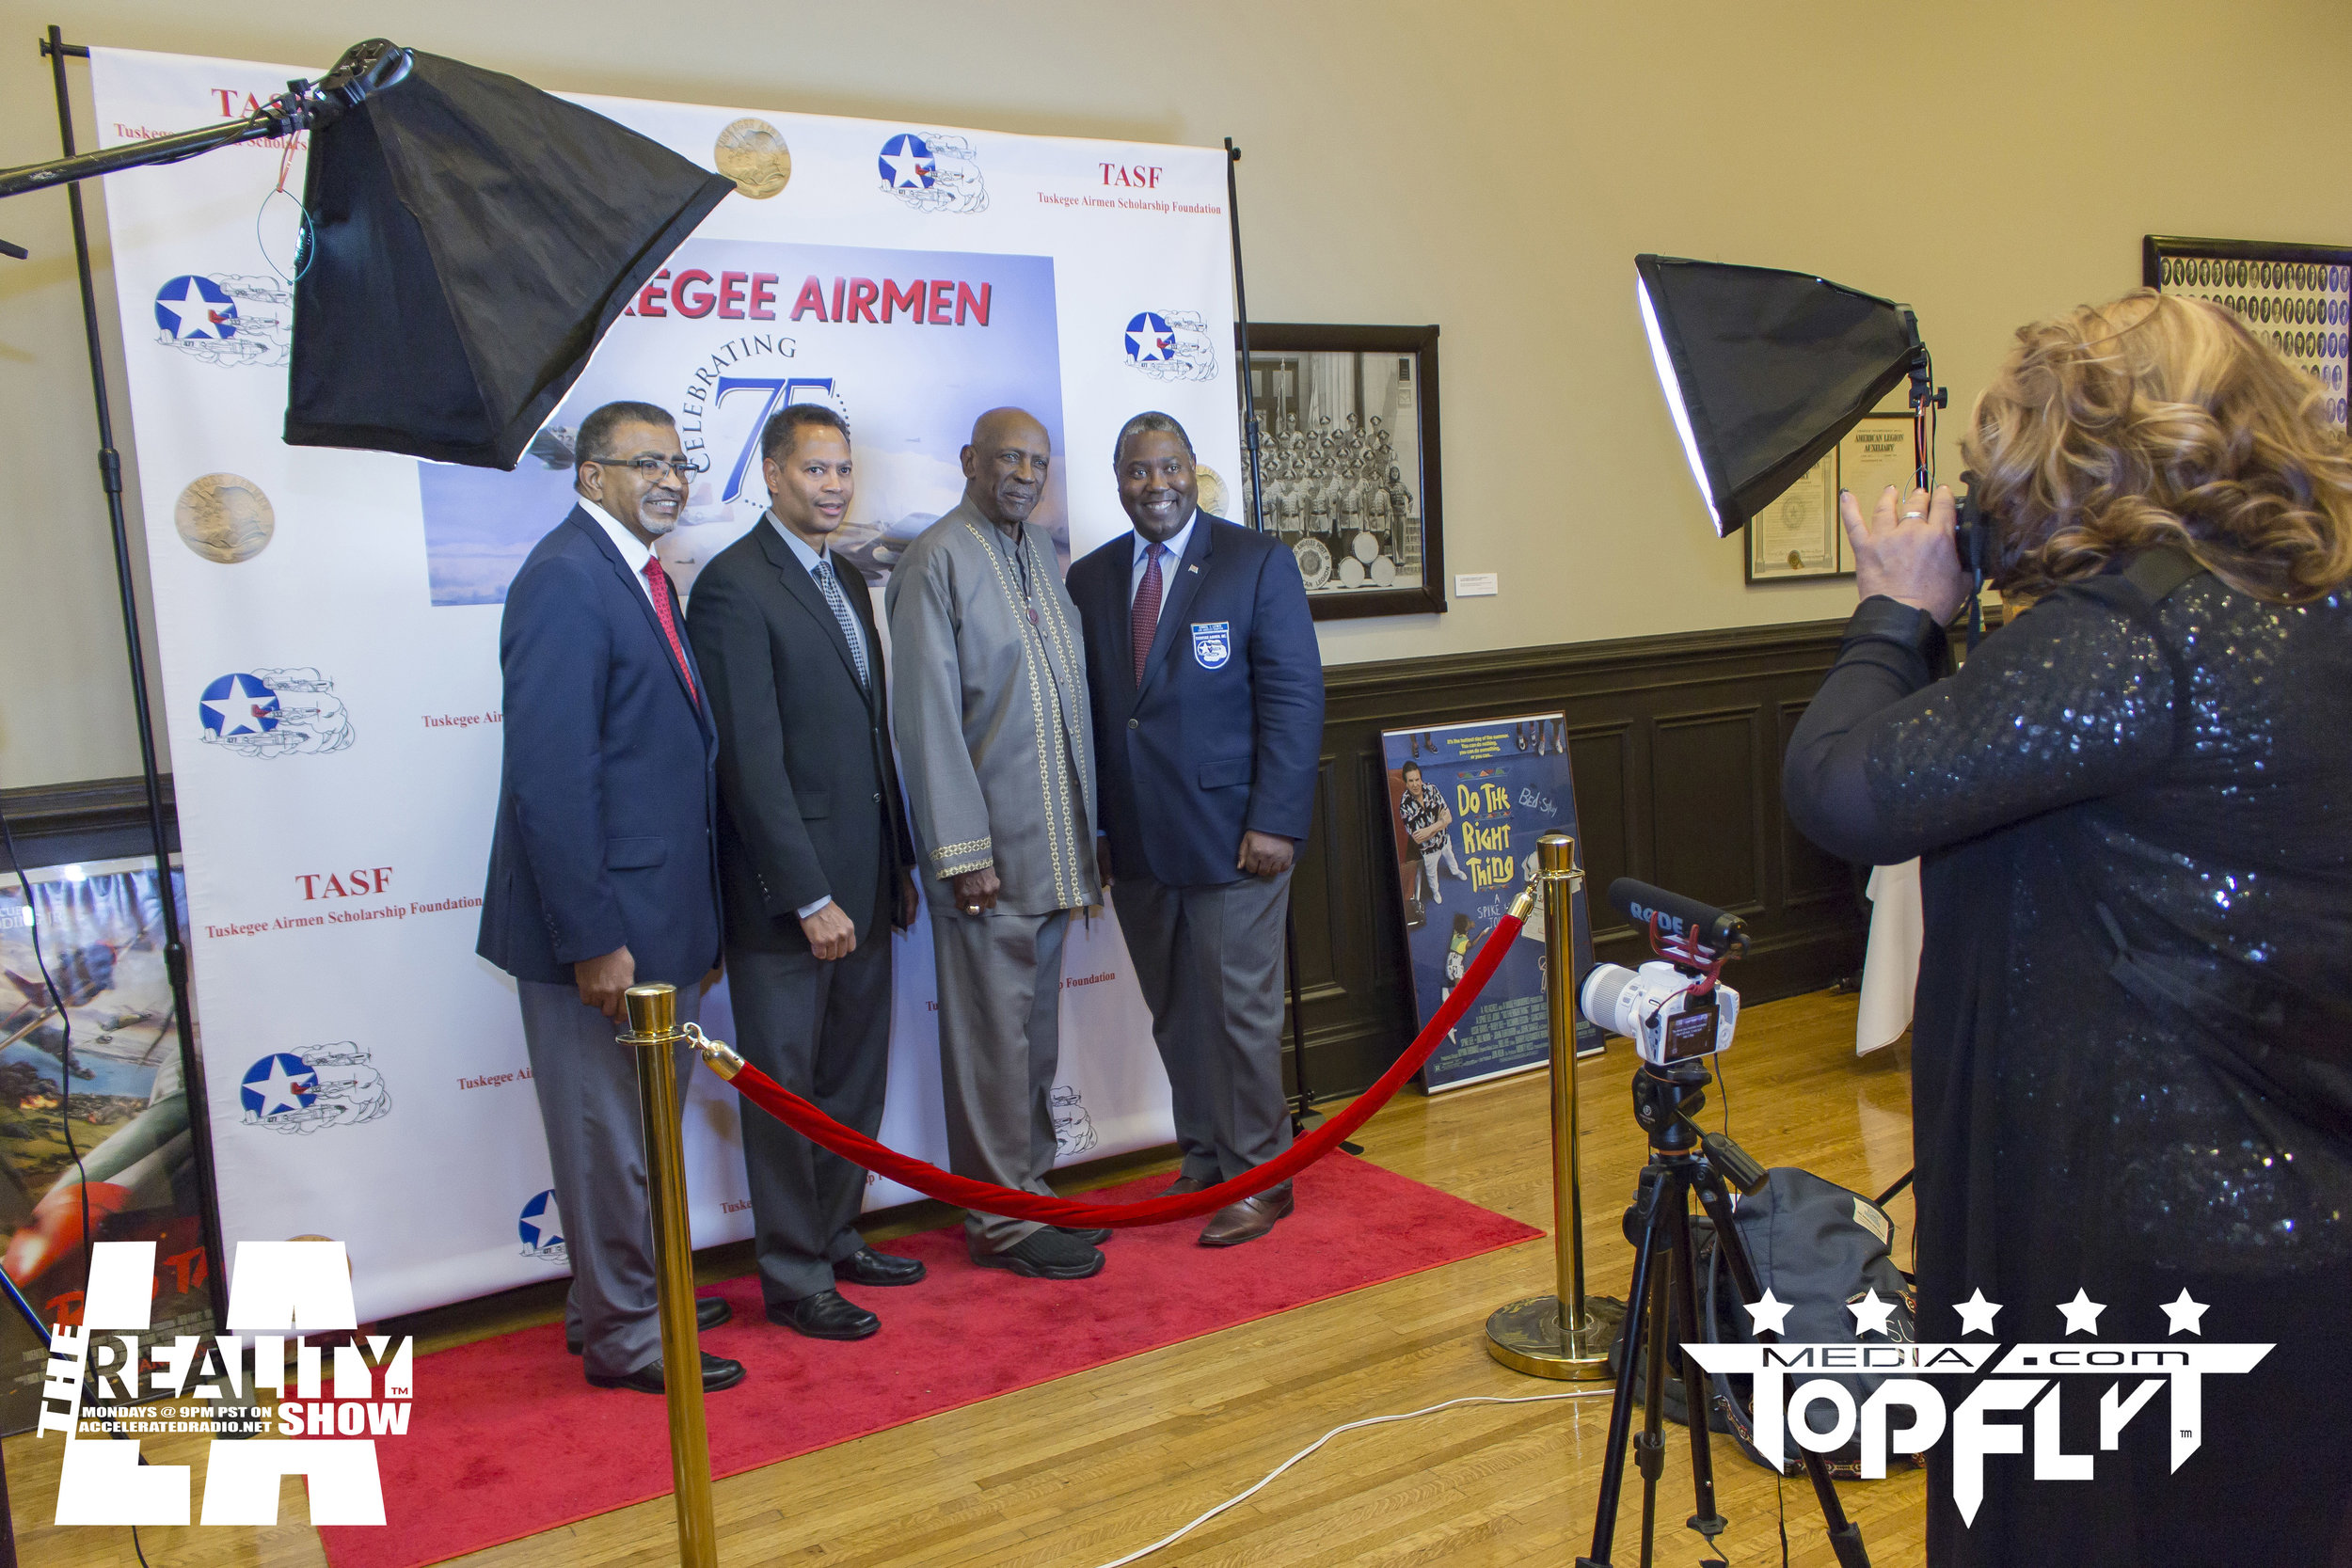 The Reality Show LA - Tuskegee Airmen 75th Anniversary VIP Reception_72.jpg